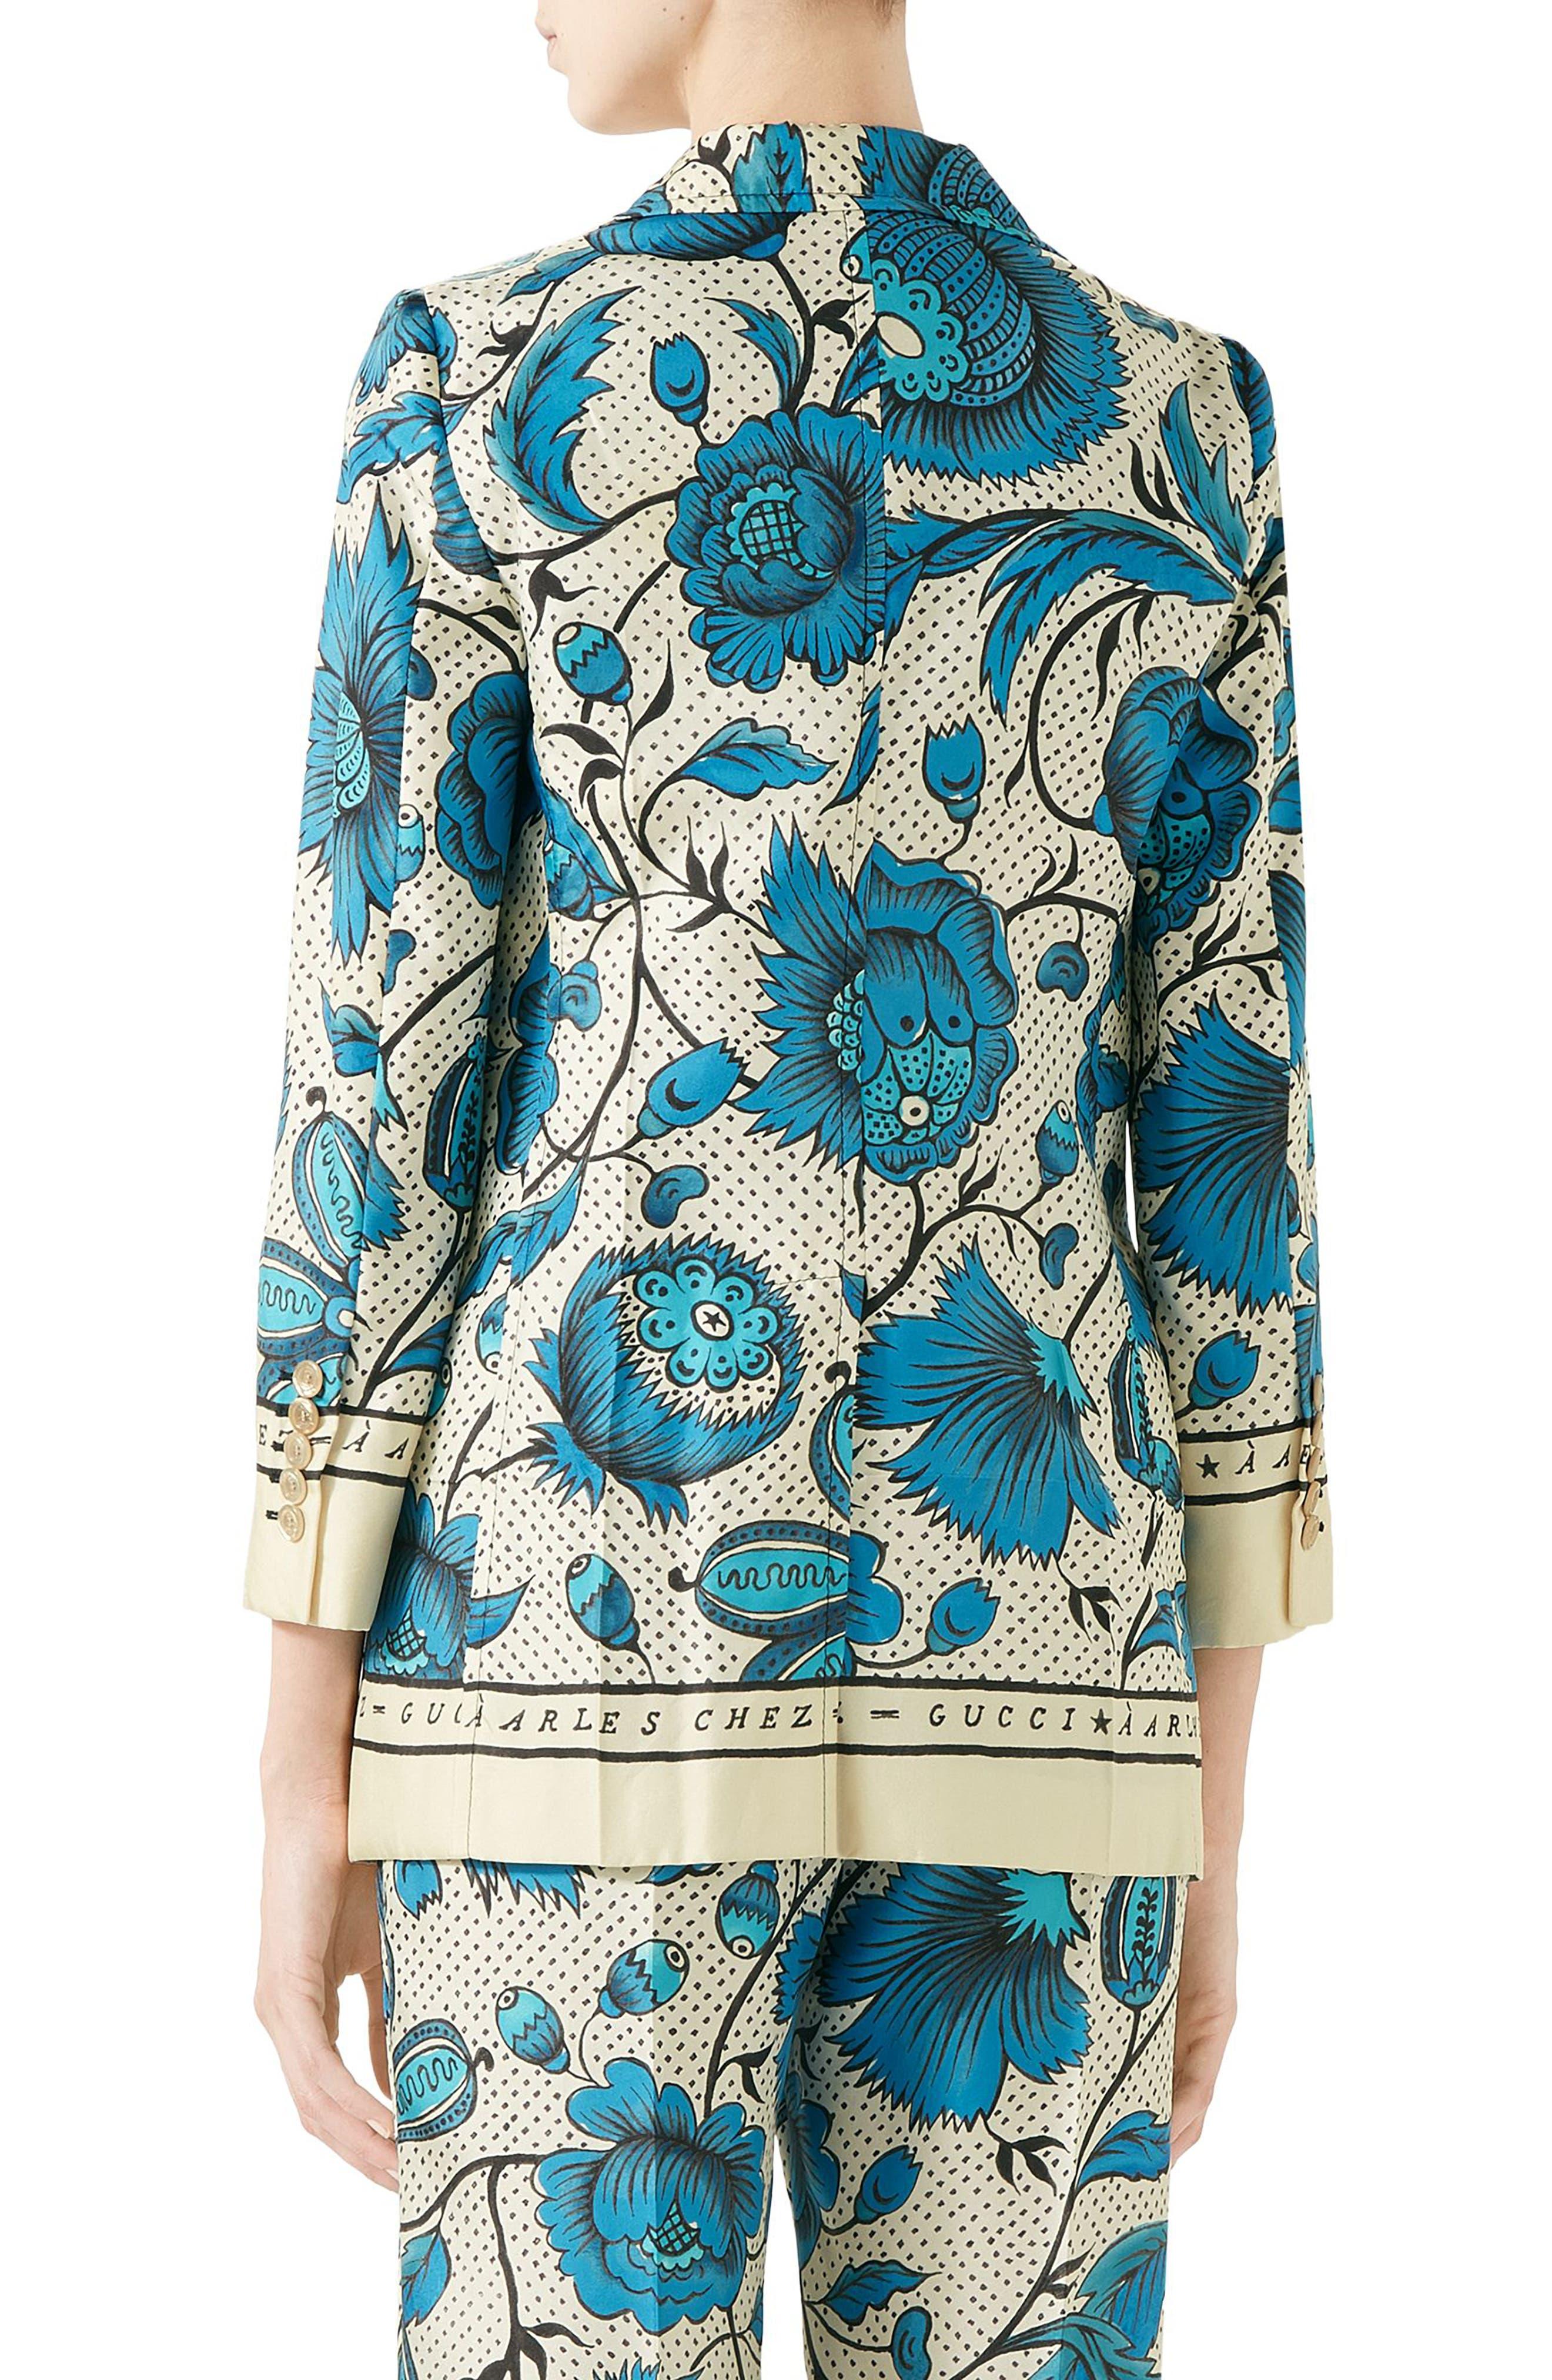 Watercolor Floral Print Silk Jacket,                             Alternate thumbnail 6, color,                             4821 BLUE/ IVORY PRT/ MC